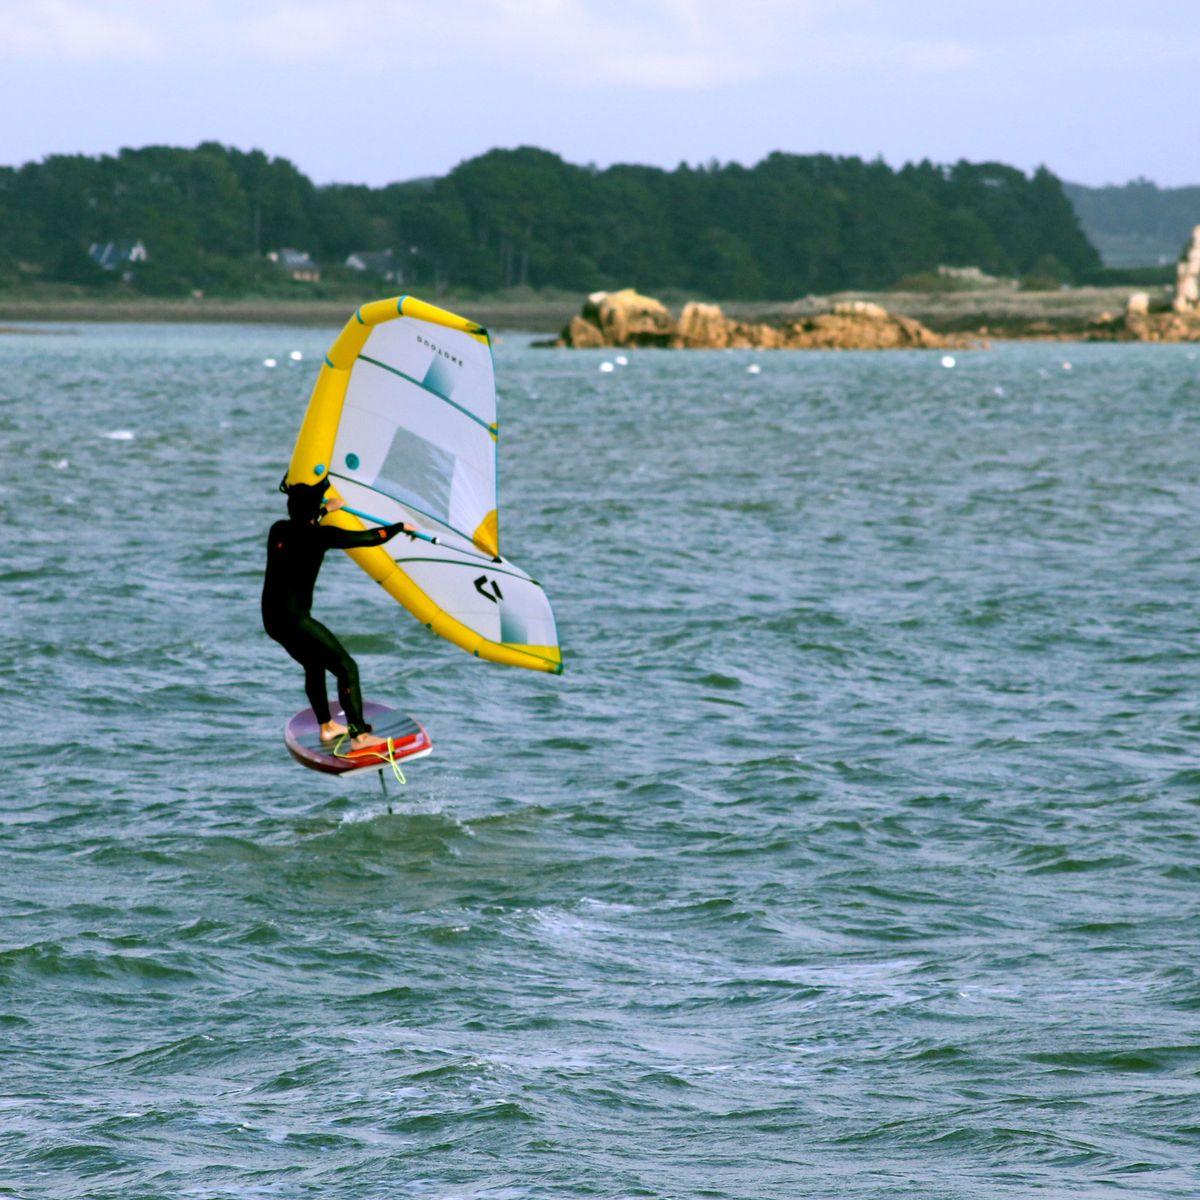 Entre Kitesurf Et Windsurf Le Wing Foil Decolle